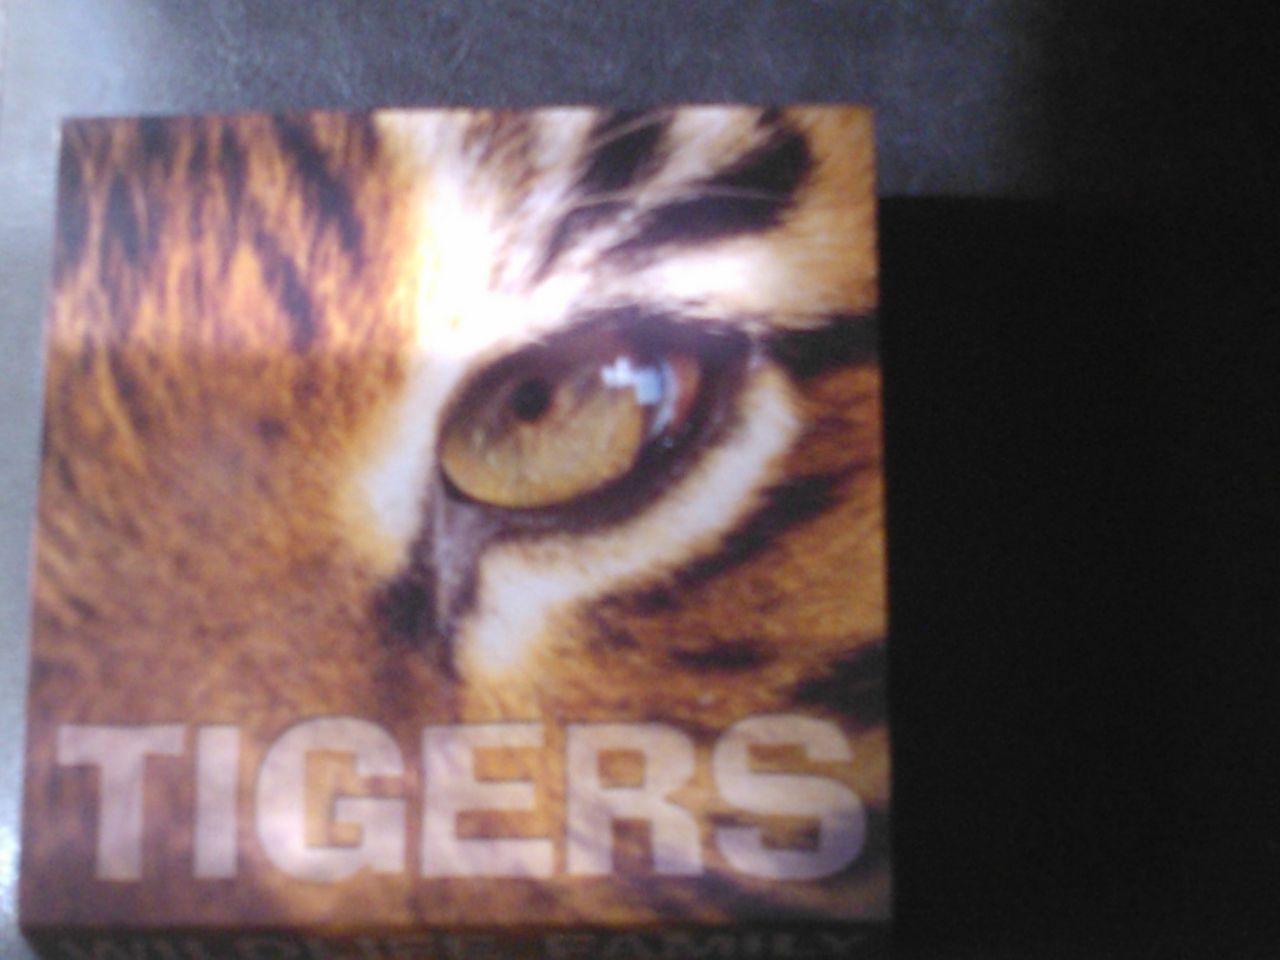 Tigers Wildlife Family Panthera Tigris Silver Coin 1$ 1 Oz Niue 2013 WP_000553